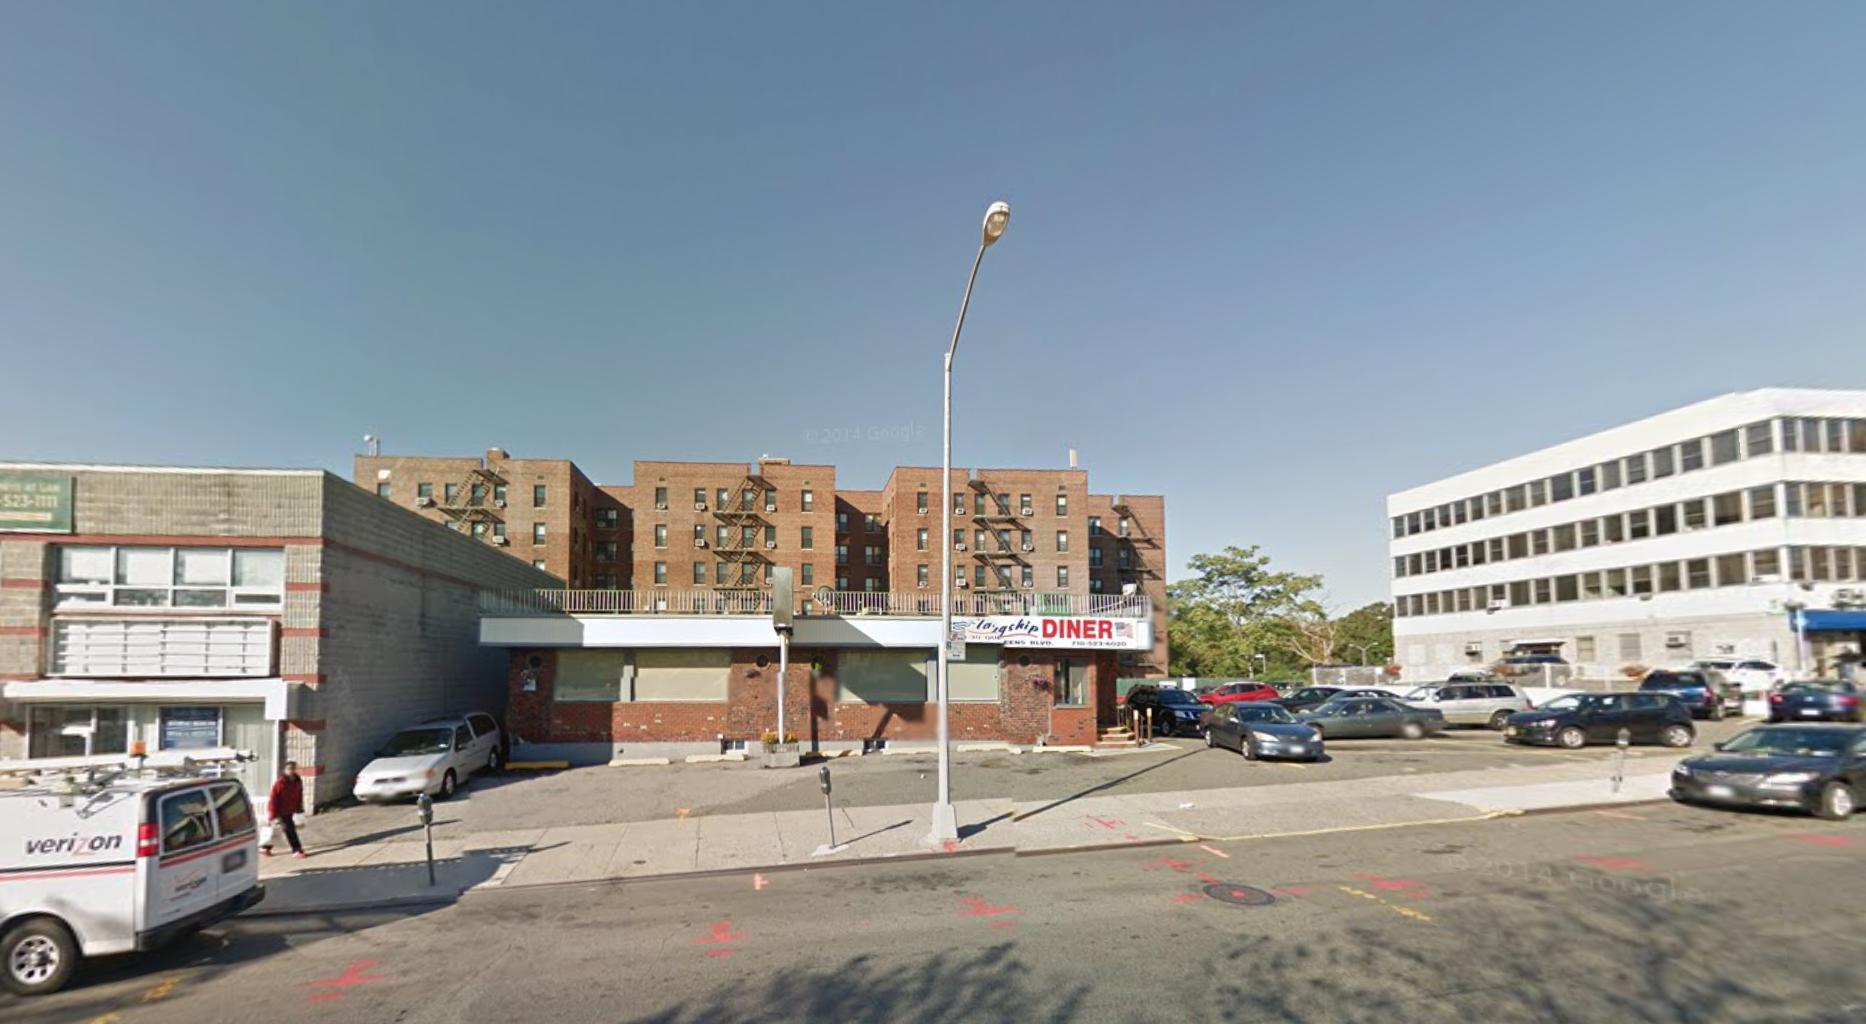 138-28 Queens Boulevard, image via Google Maps